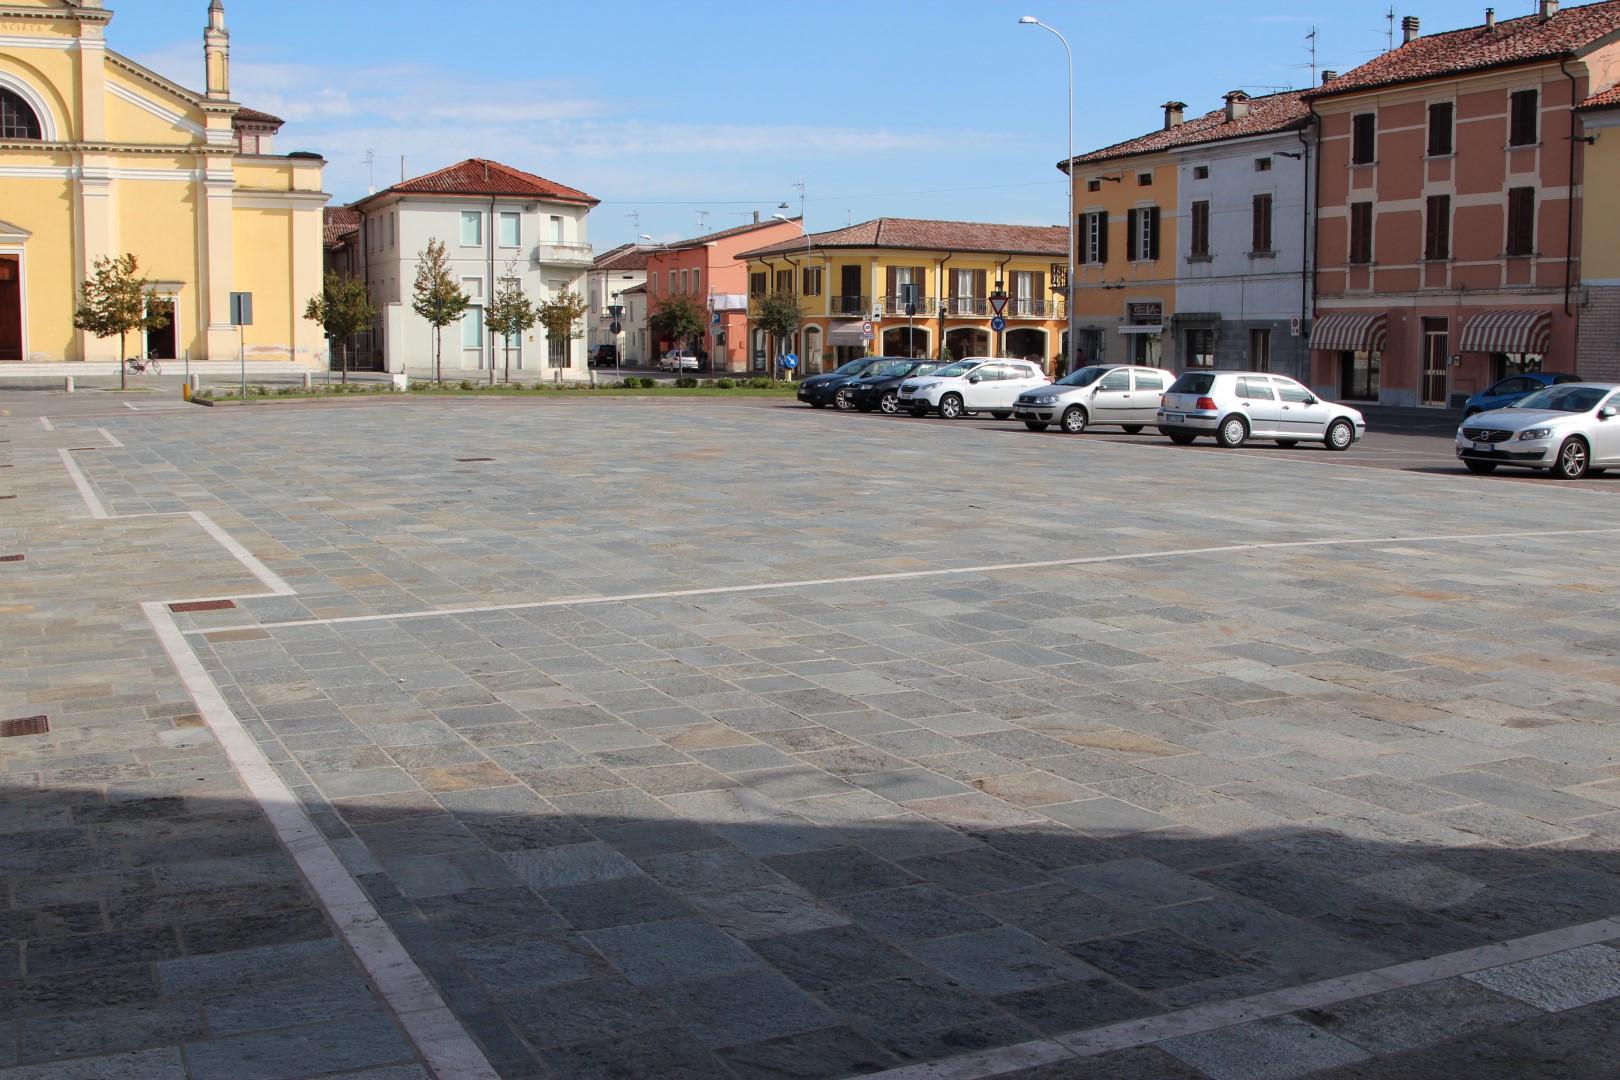 Piazza Comaschi - Gussola (CR)